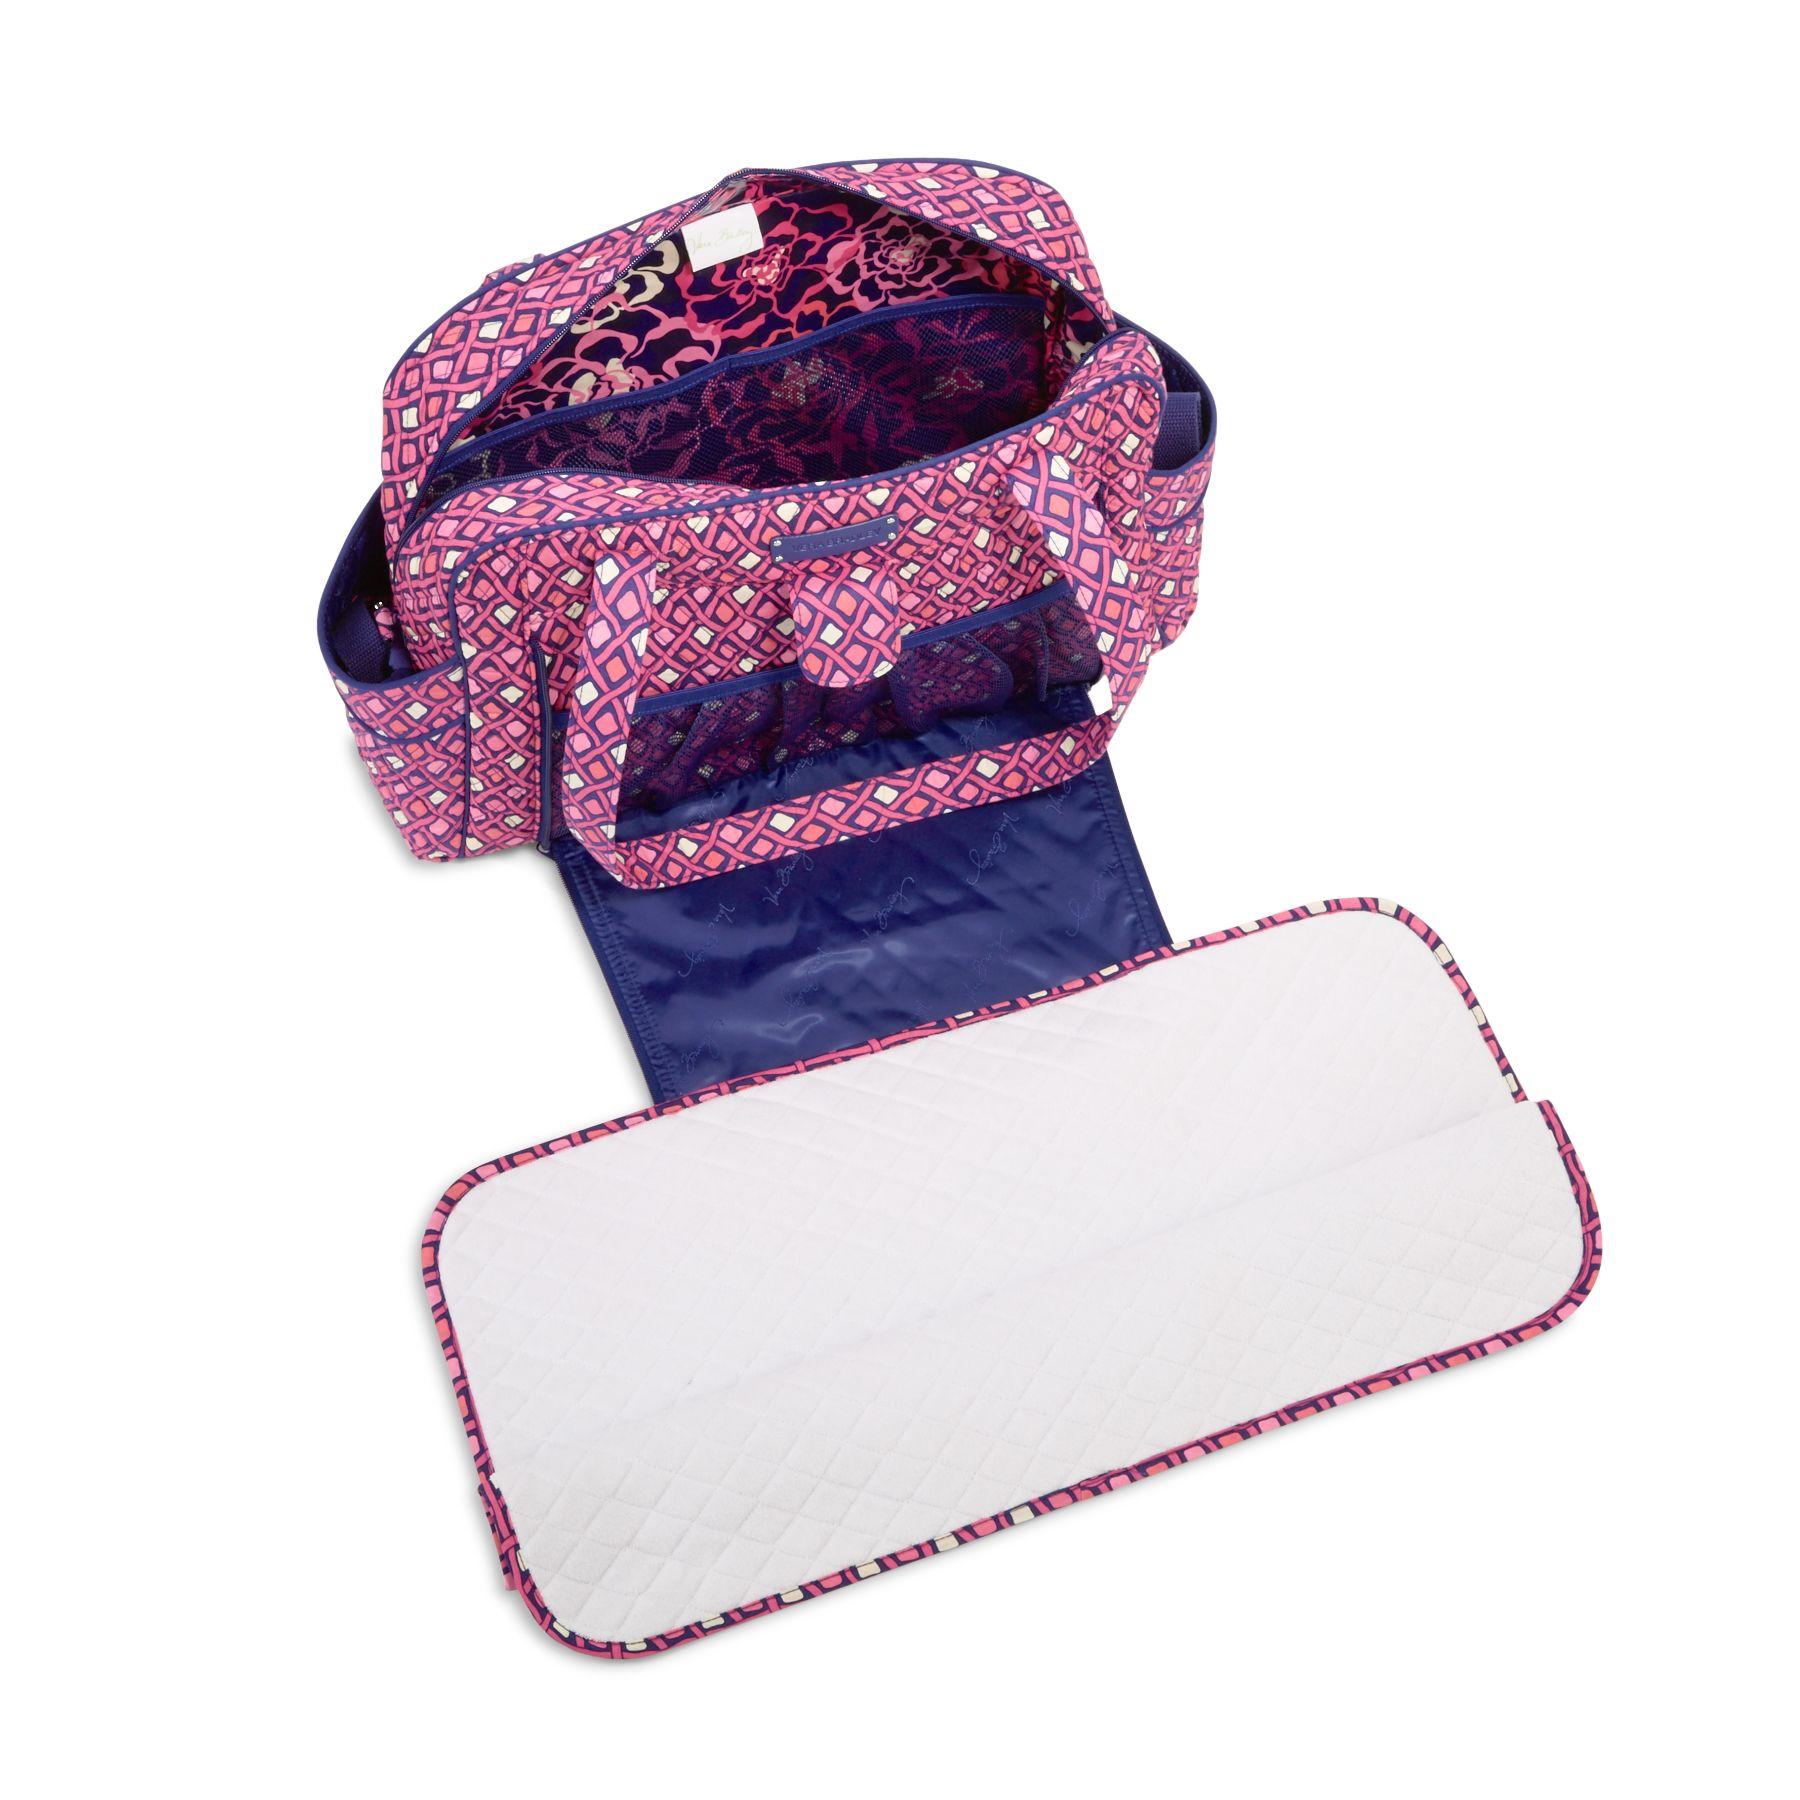 vera bradley stroll around baby diaper bag ebay. Black Bedroom Furniture Sets. Home Design Ideas